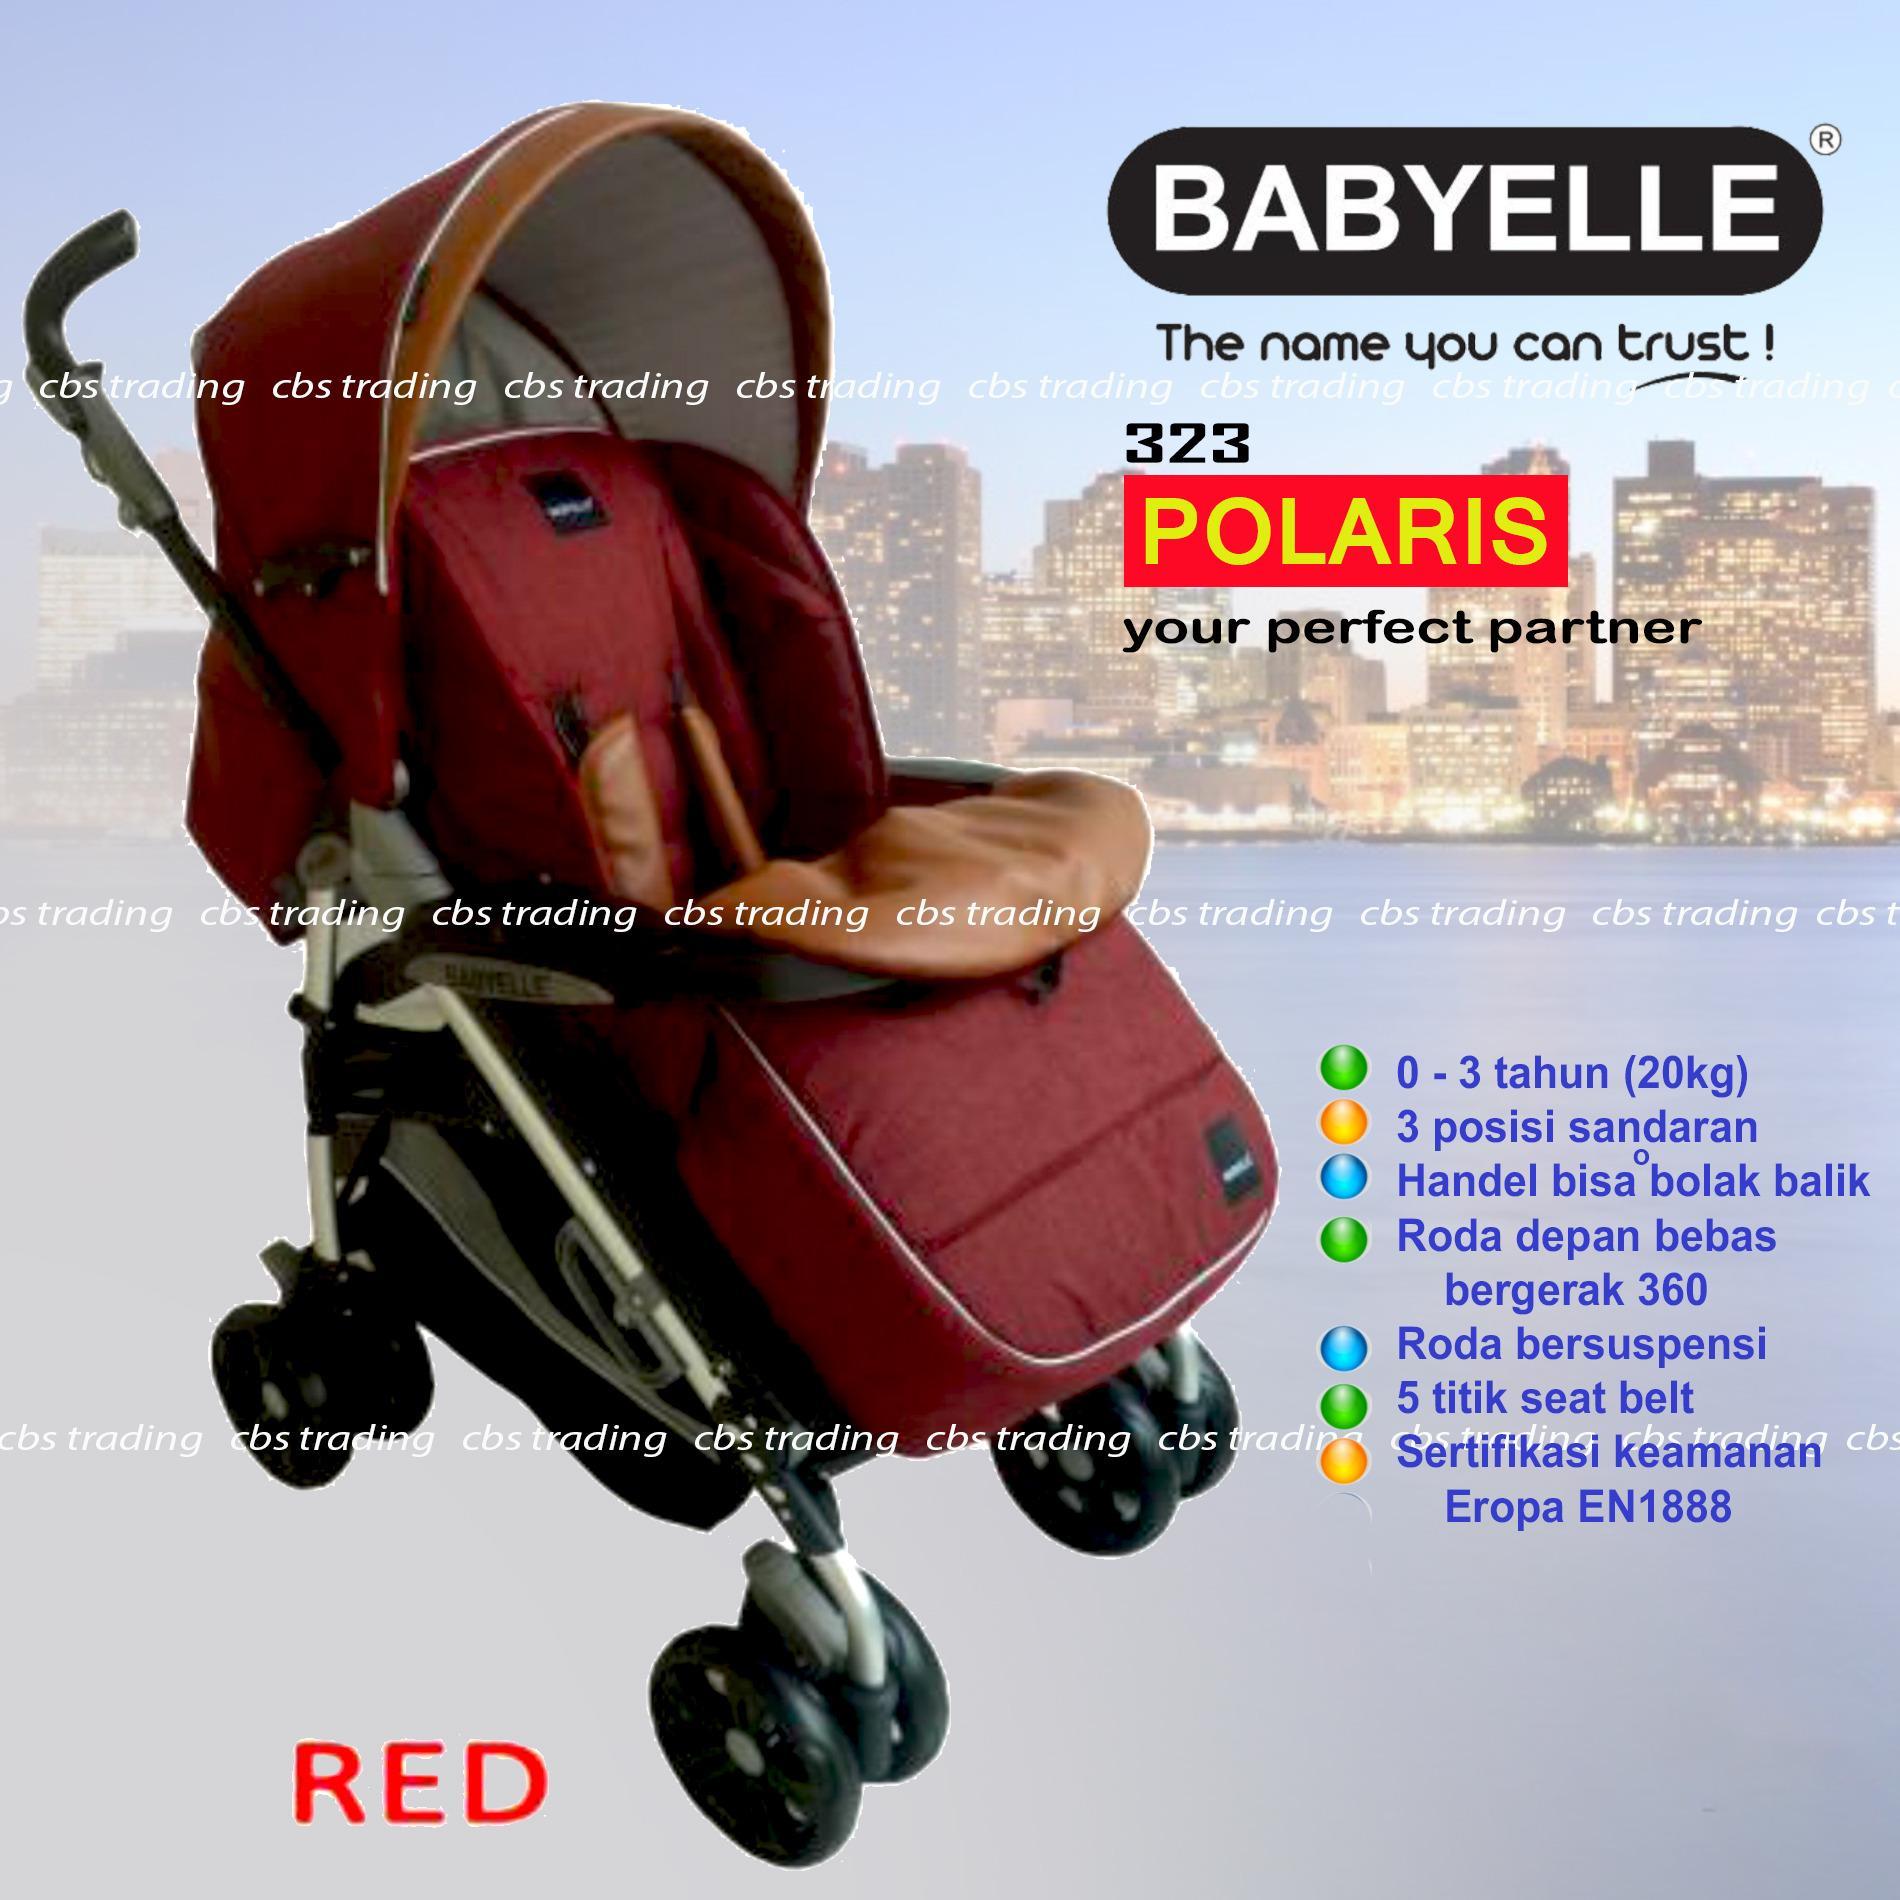 Diskon Babyelle New Polaris Stroller Single S 323 Baby Elle Polaris Baby Stroller Kereta Dorong Bayi Merah Akhir Tahun